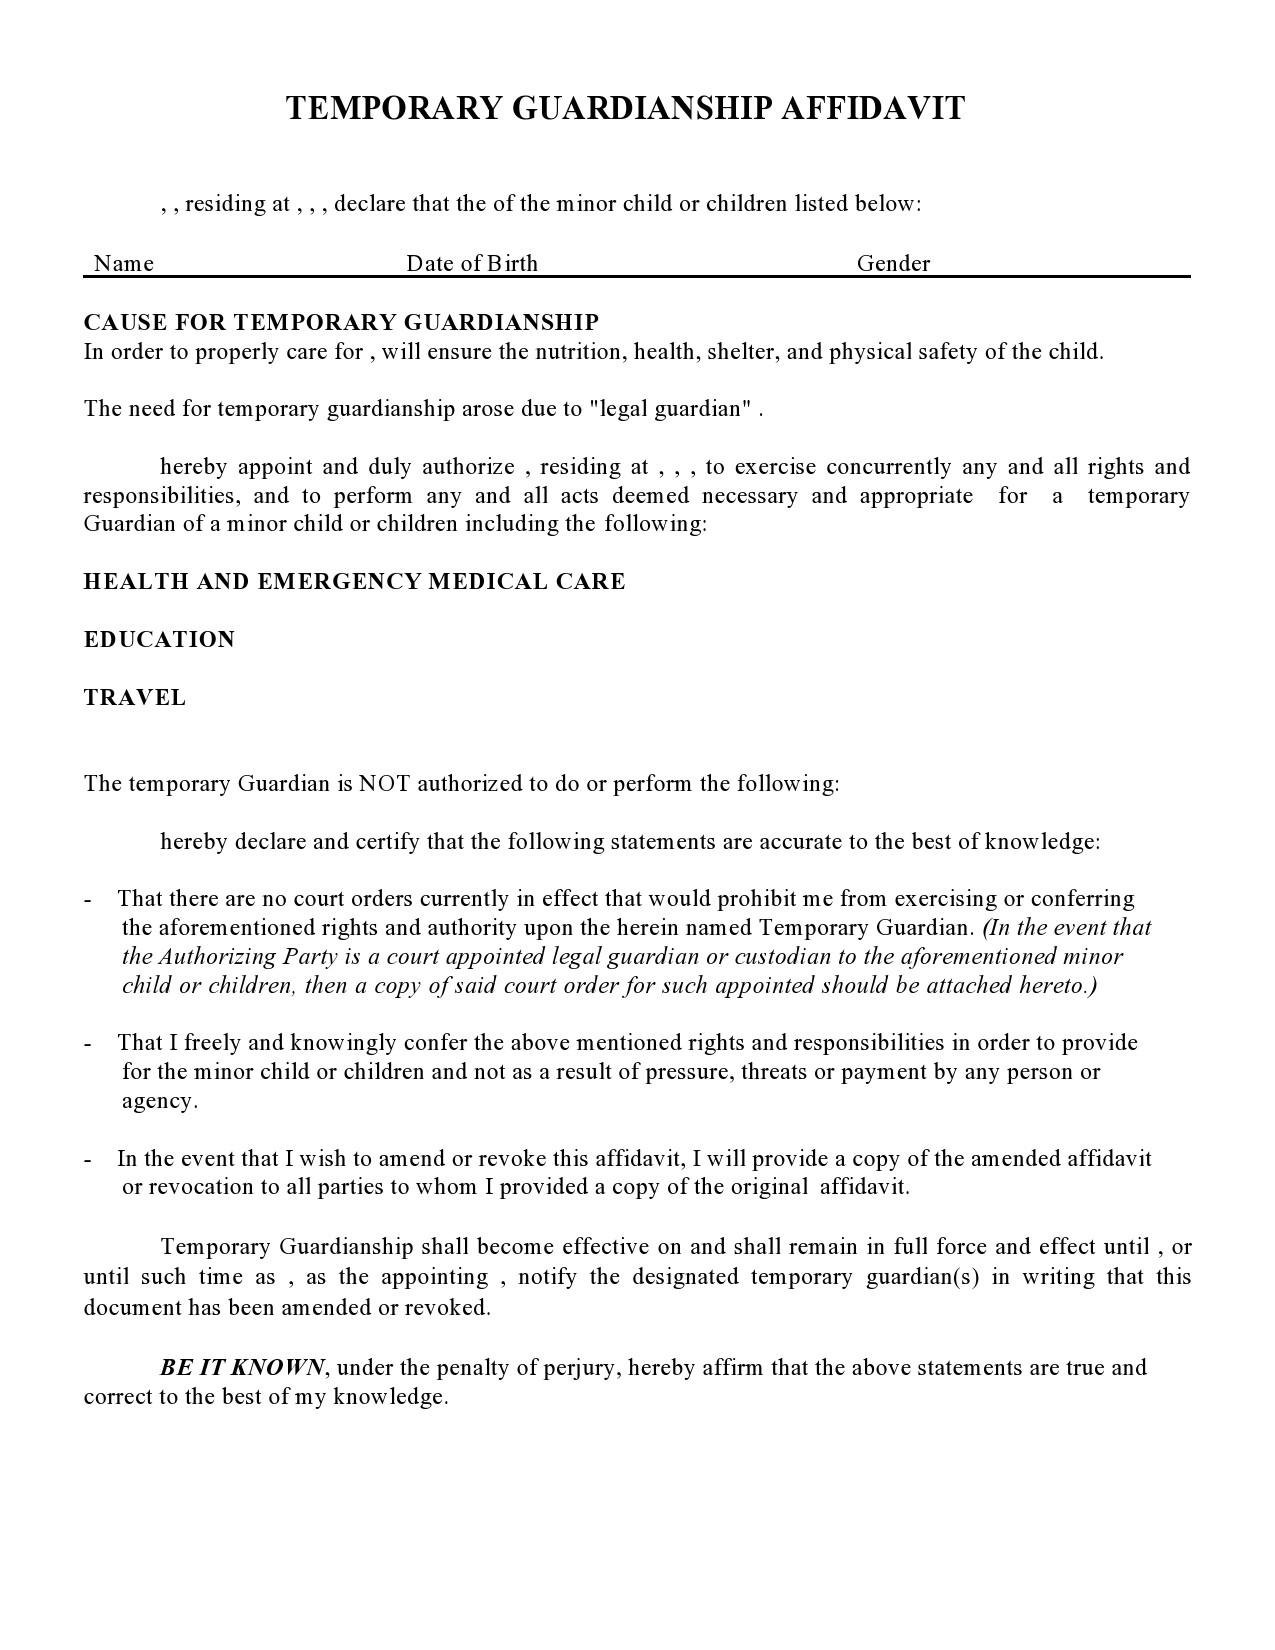 Free temporary guardianship form 11